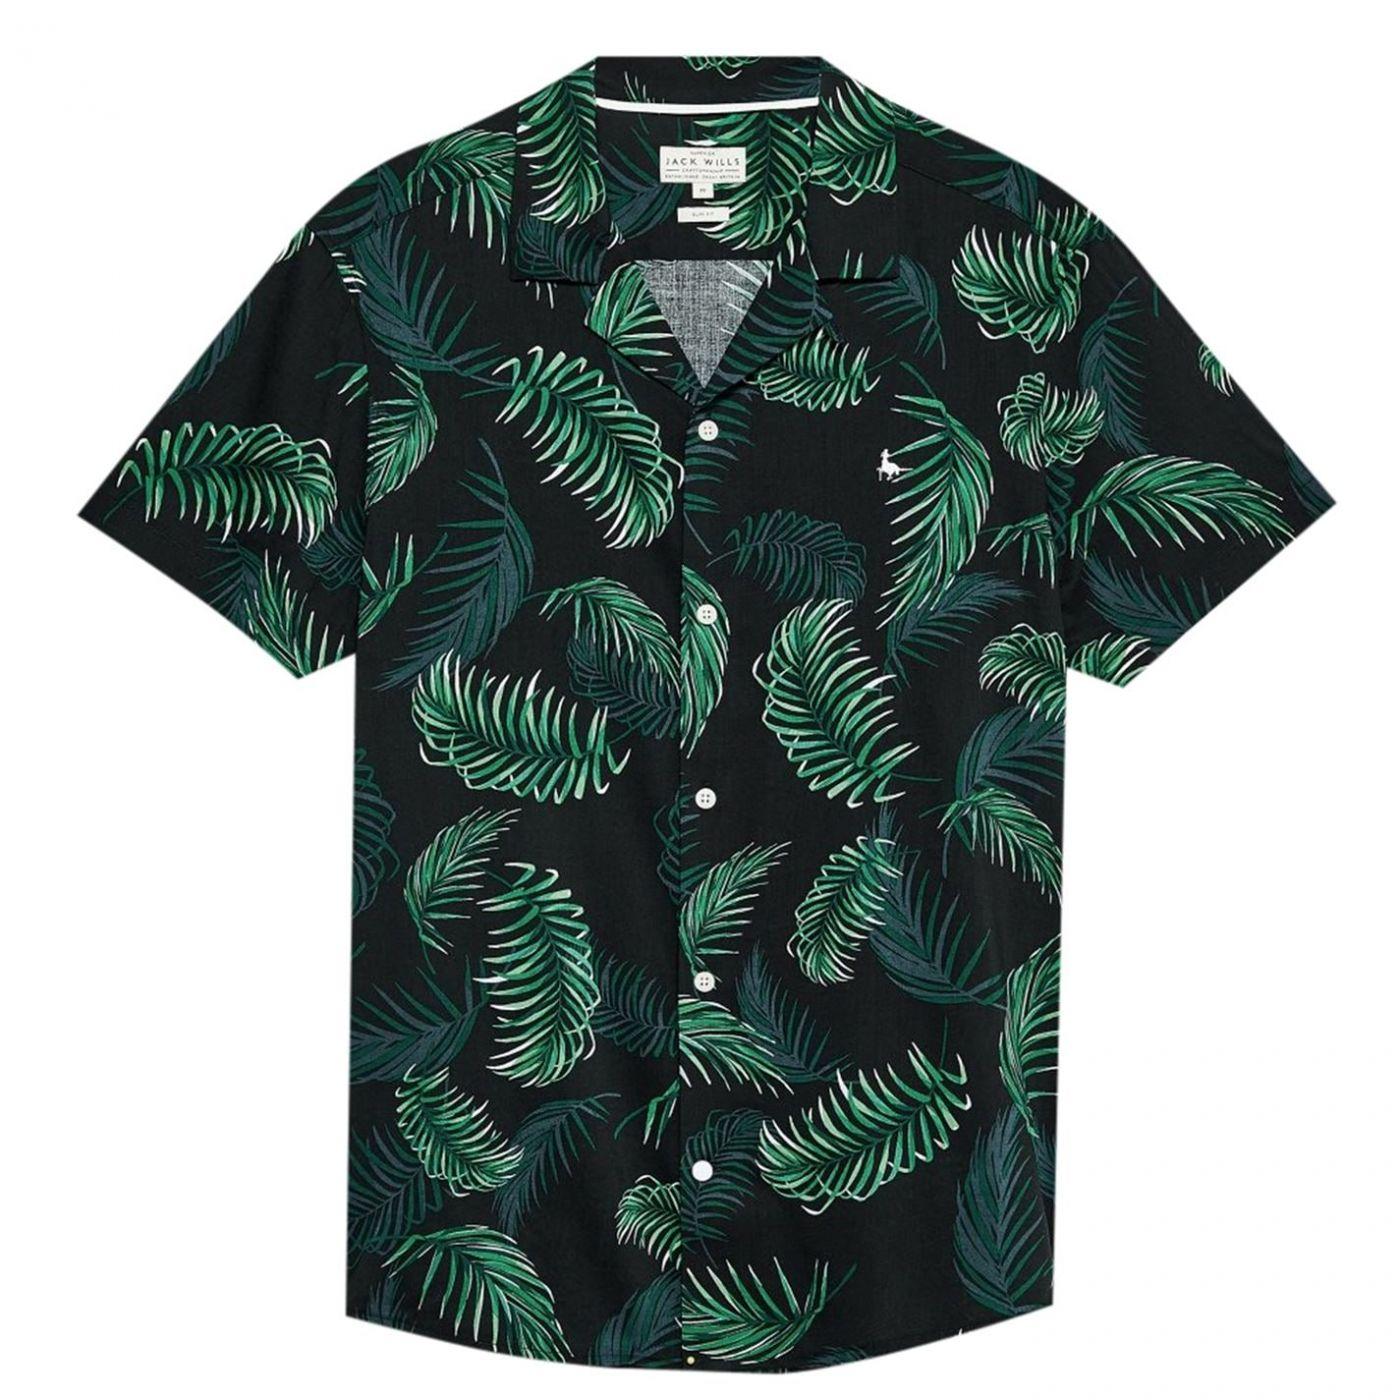 Jack Wills Abbotsham All Over Print Shirt